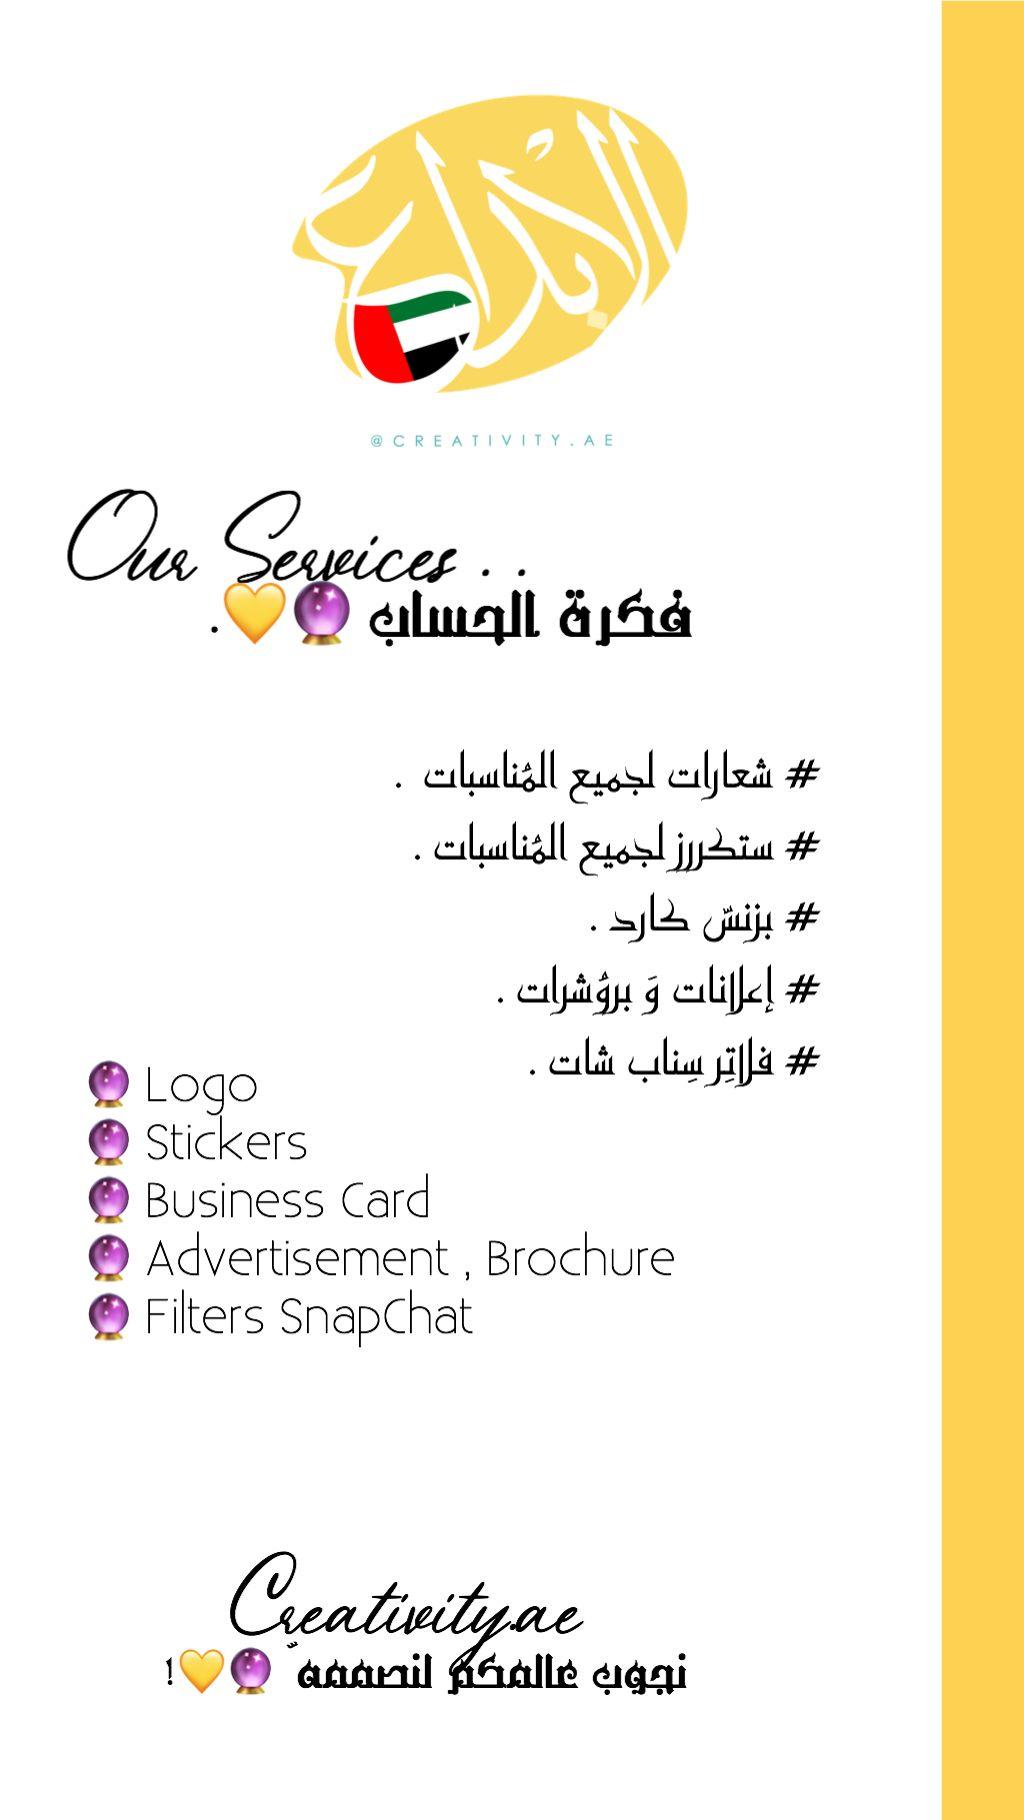 Instagram Creativity Ae Instagram Snapchat Filters Brochure